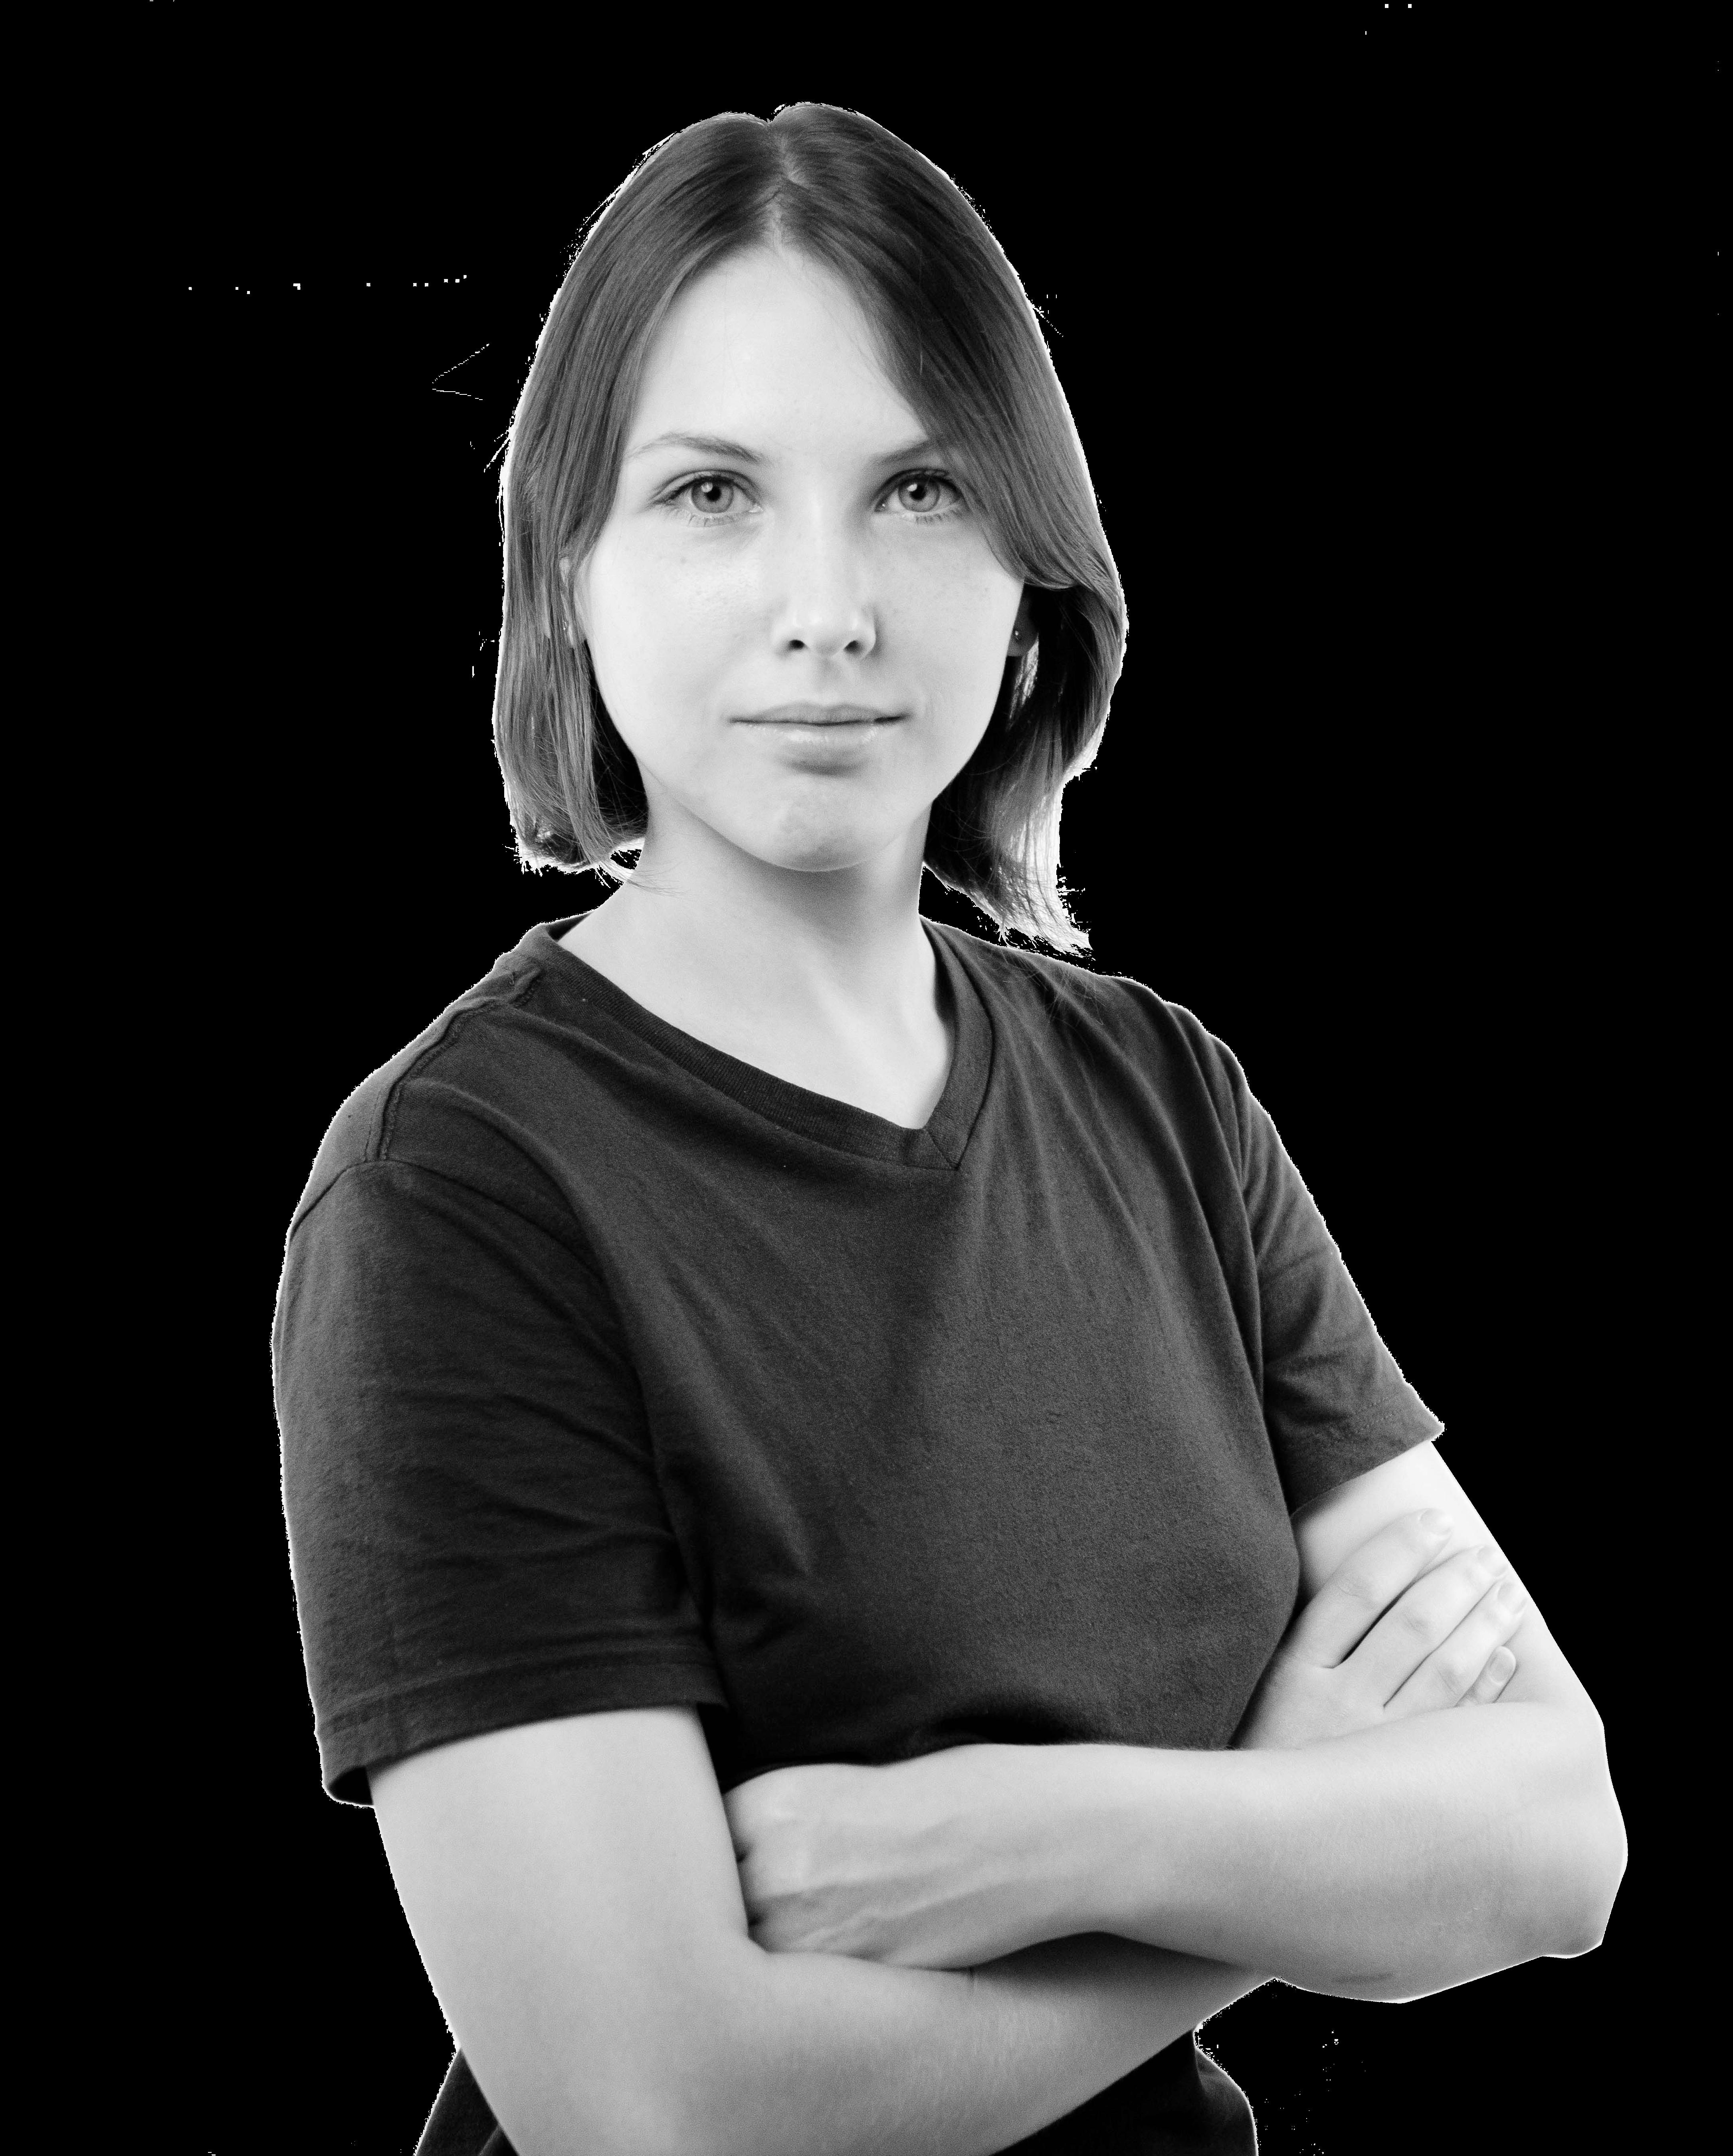 Uliana Sentsova